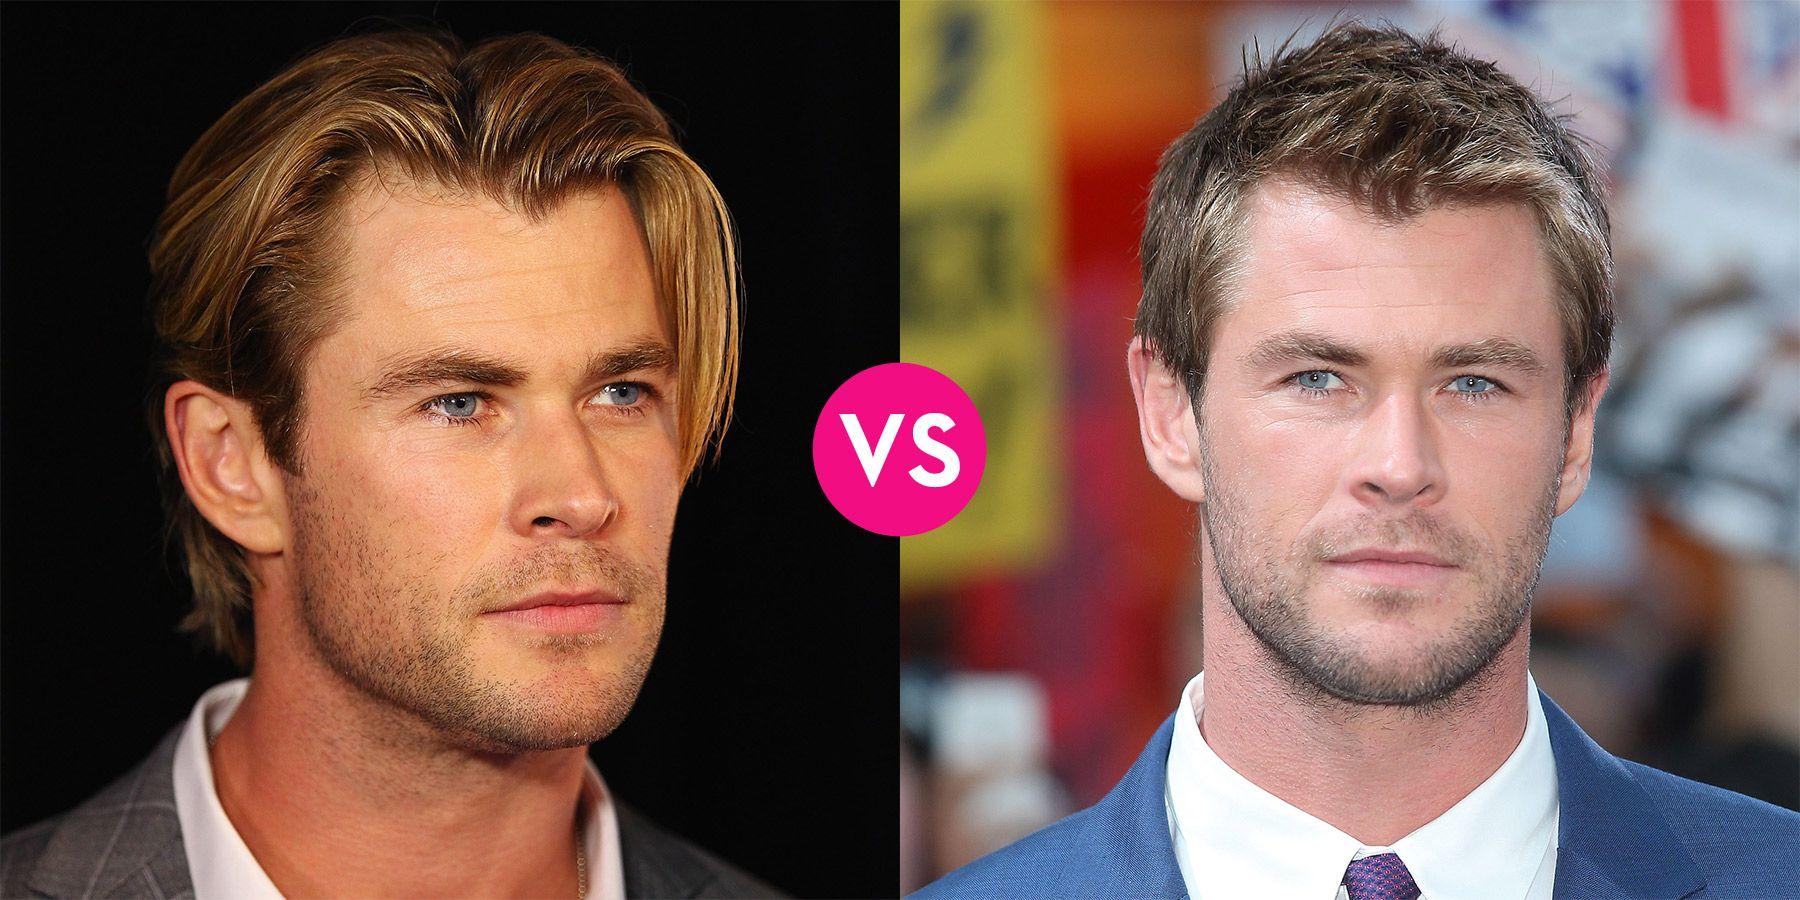 Famous Men With Long Hair vs Short Hair \u2014 Male Celebrity